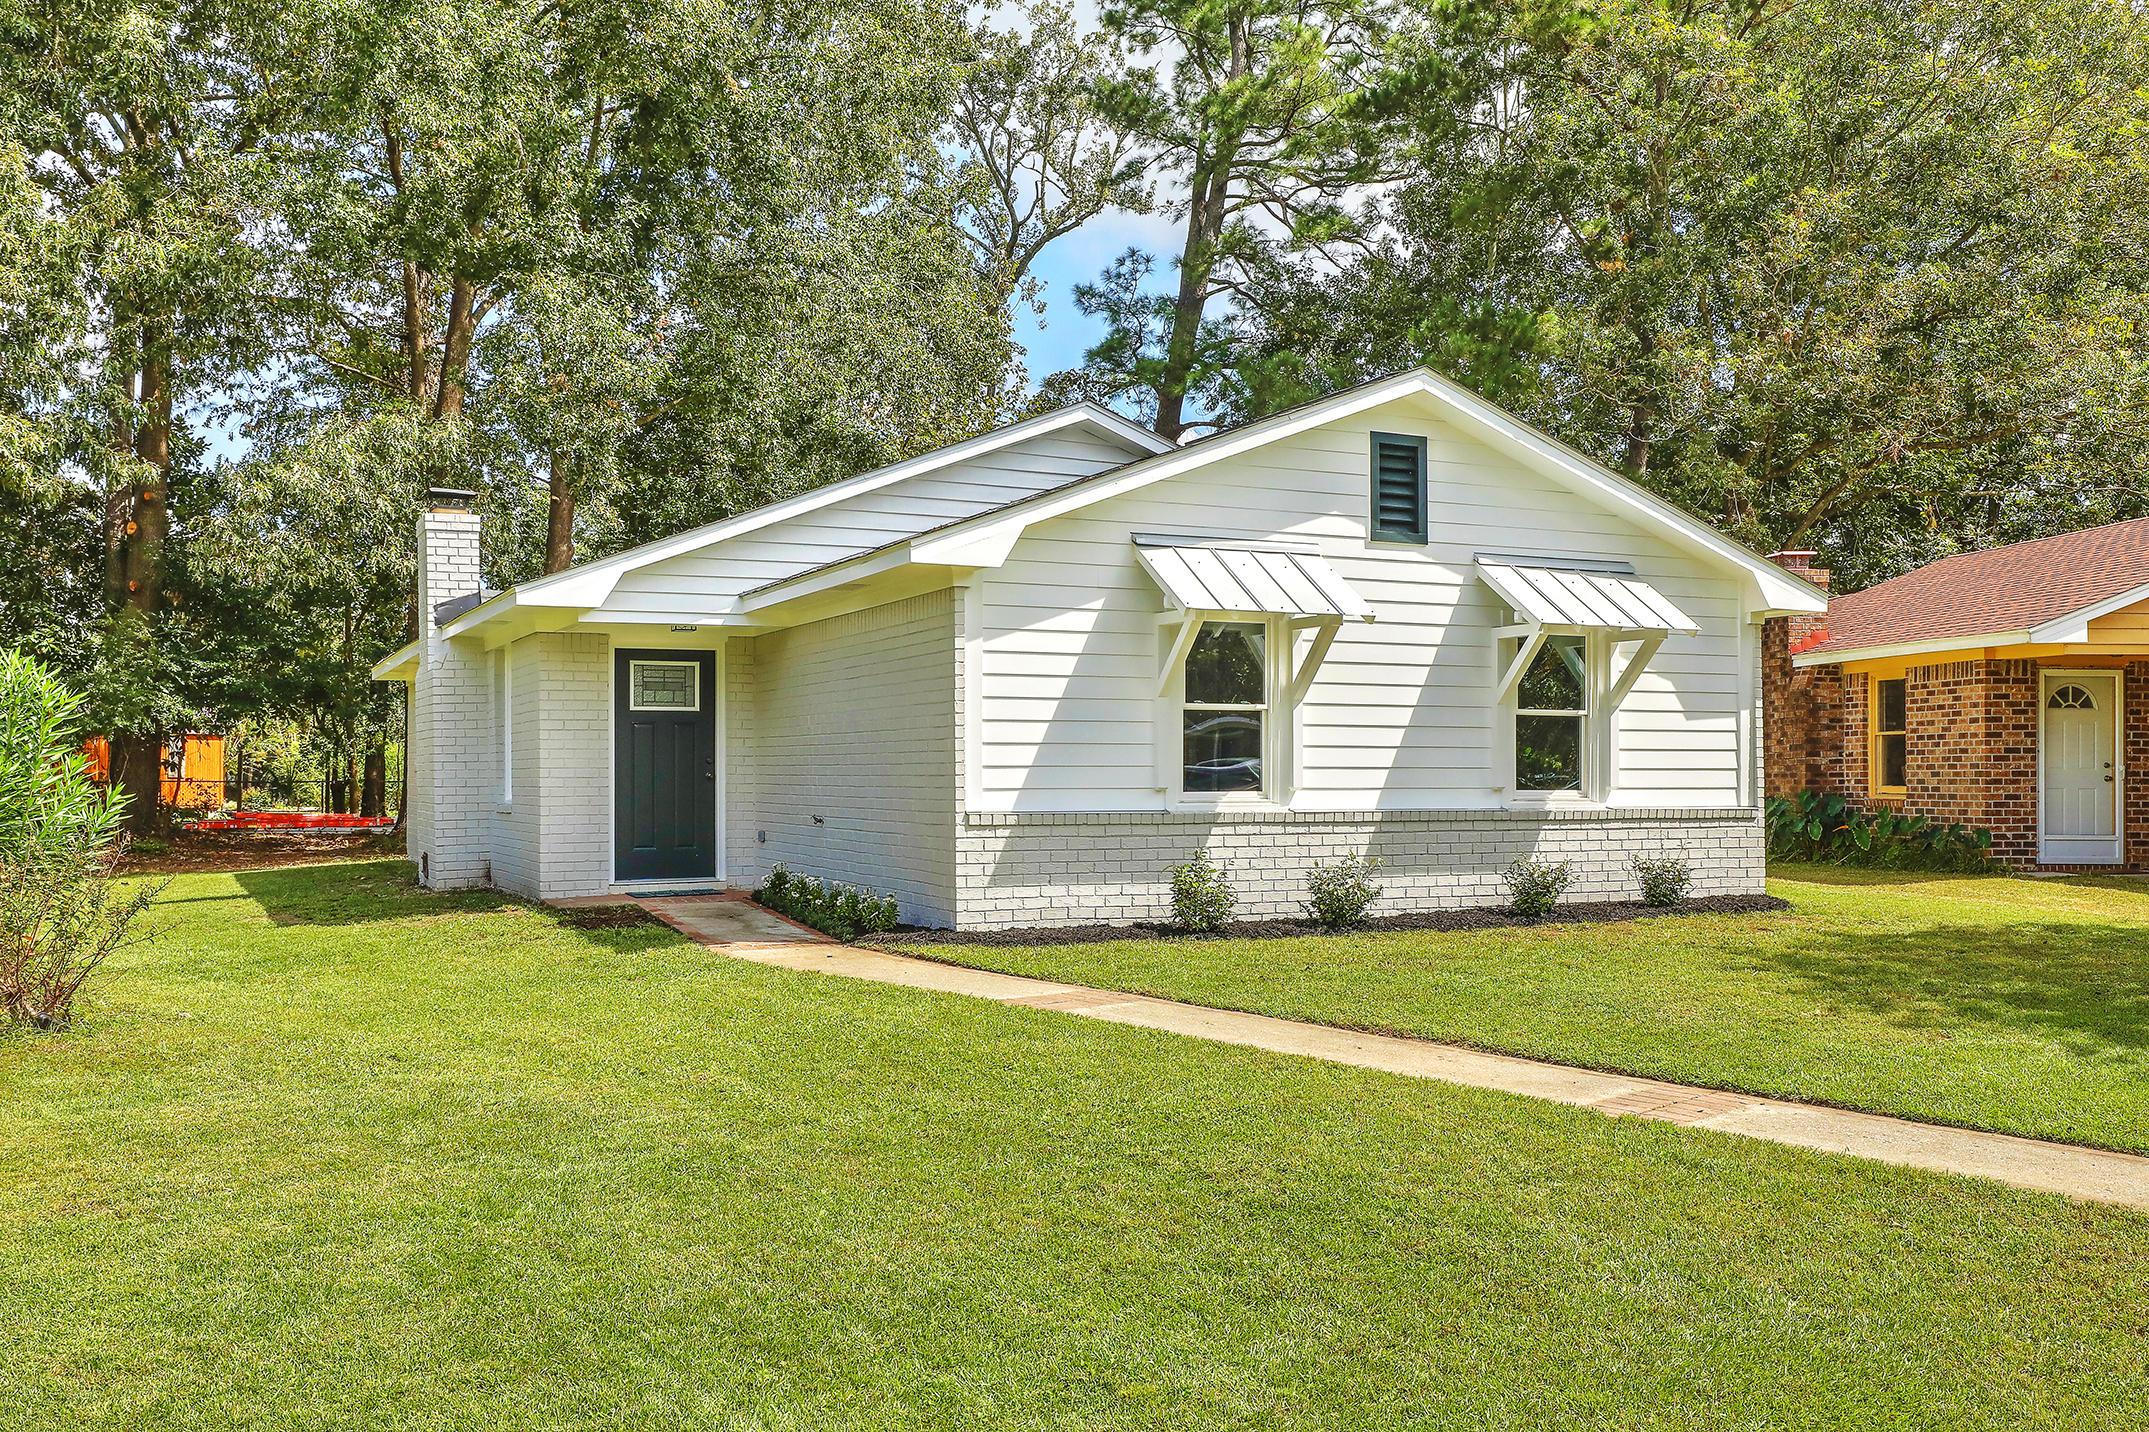 Bruno Acres Homes For Sale - 1674 Durkee, Charleston, SC - 0